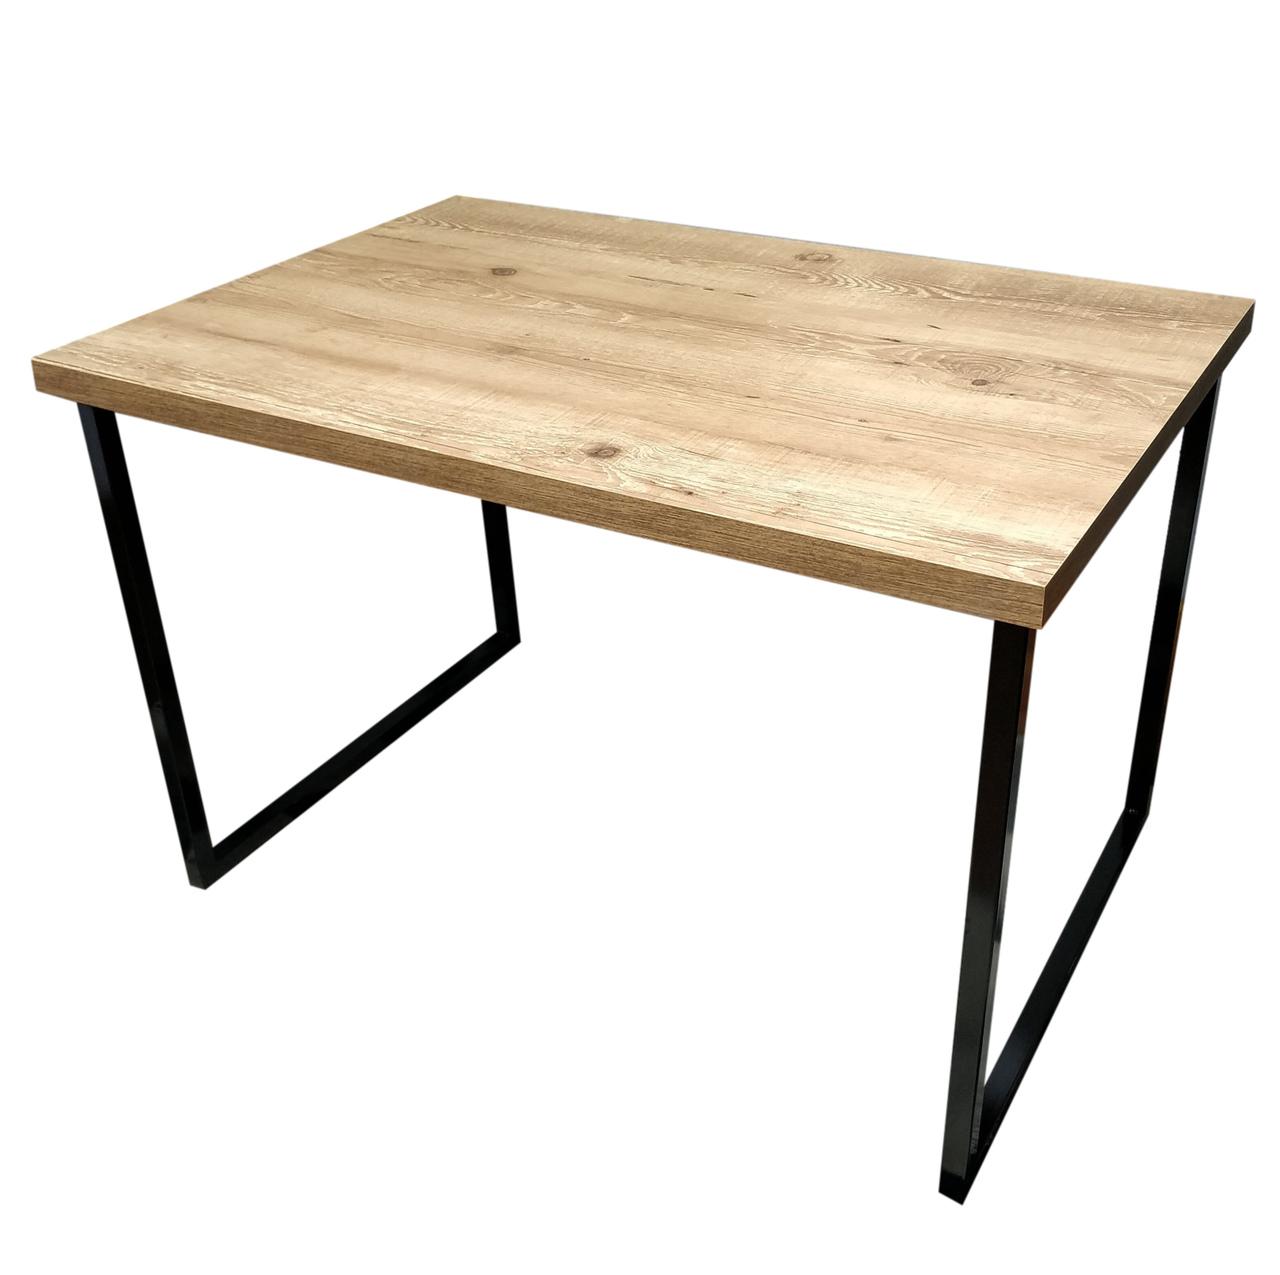 Mesa de Jantar Antiqua Squared Legs com 4 Cadeiras Eames Pretas  - Mtne Store